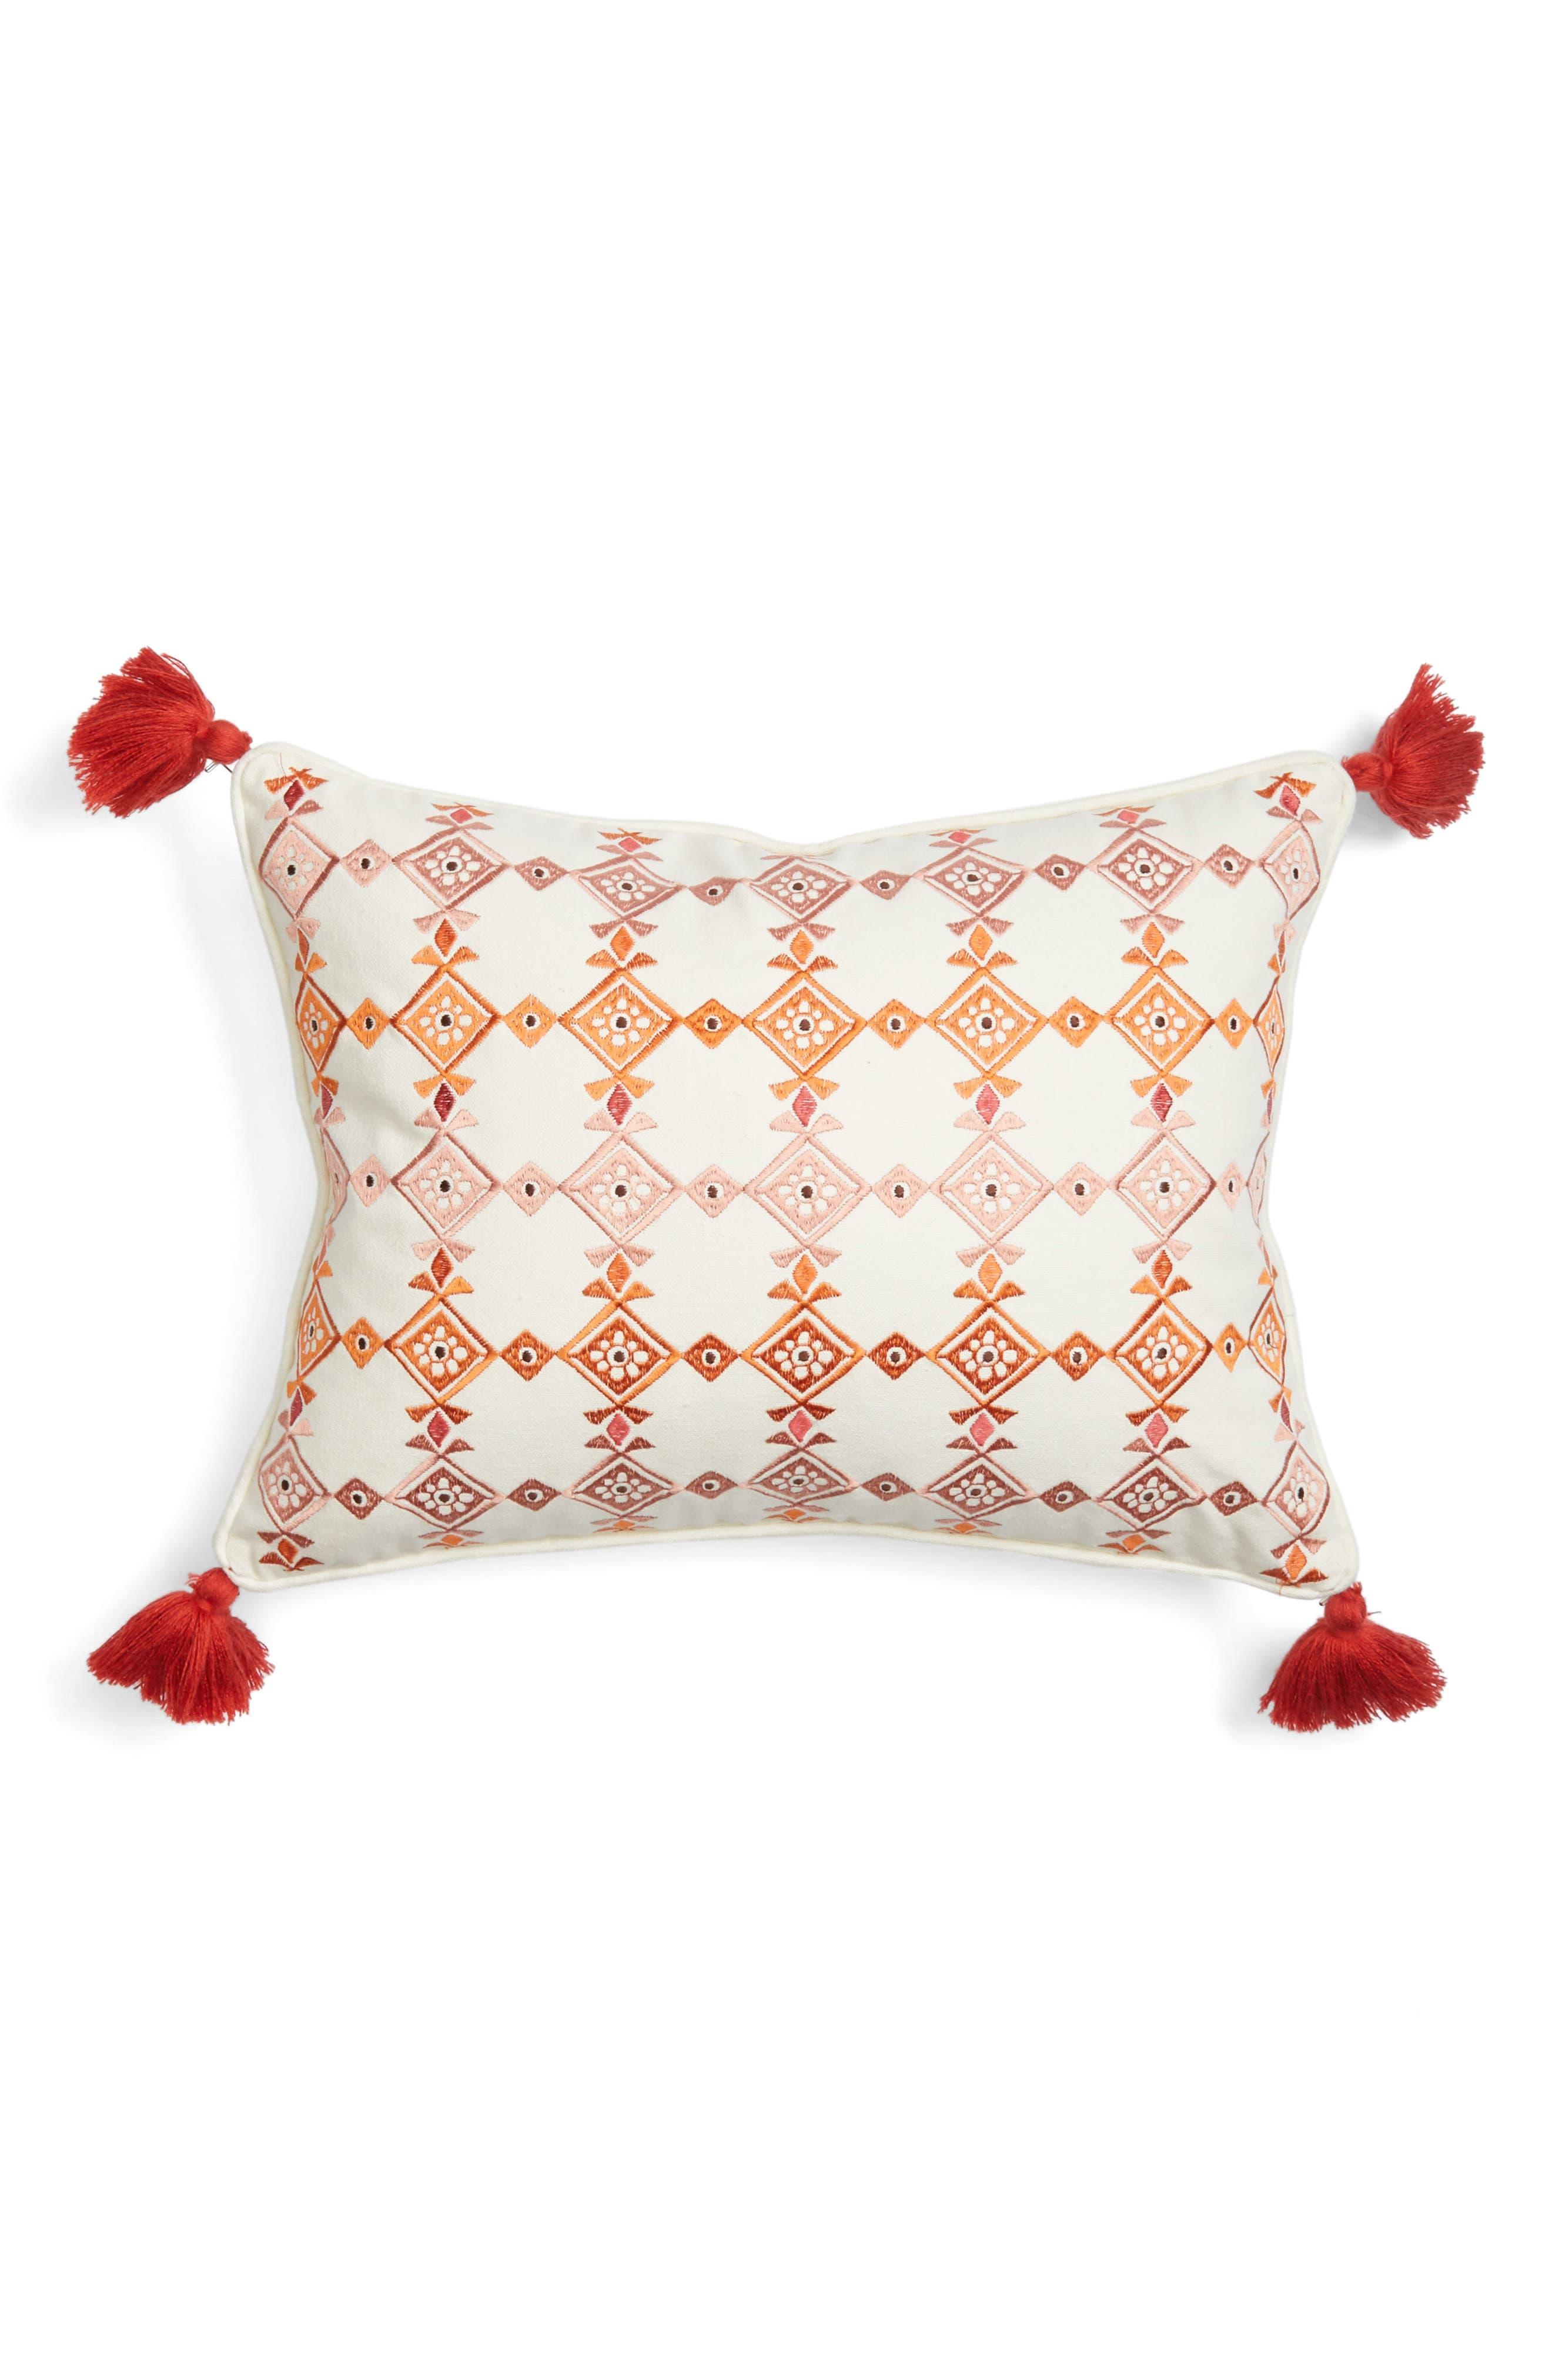 Piper Tassel Pillow,                         Main,                         color, Red/ Multi